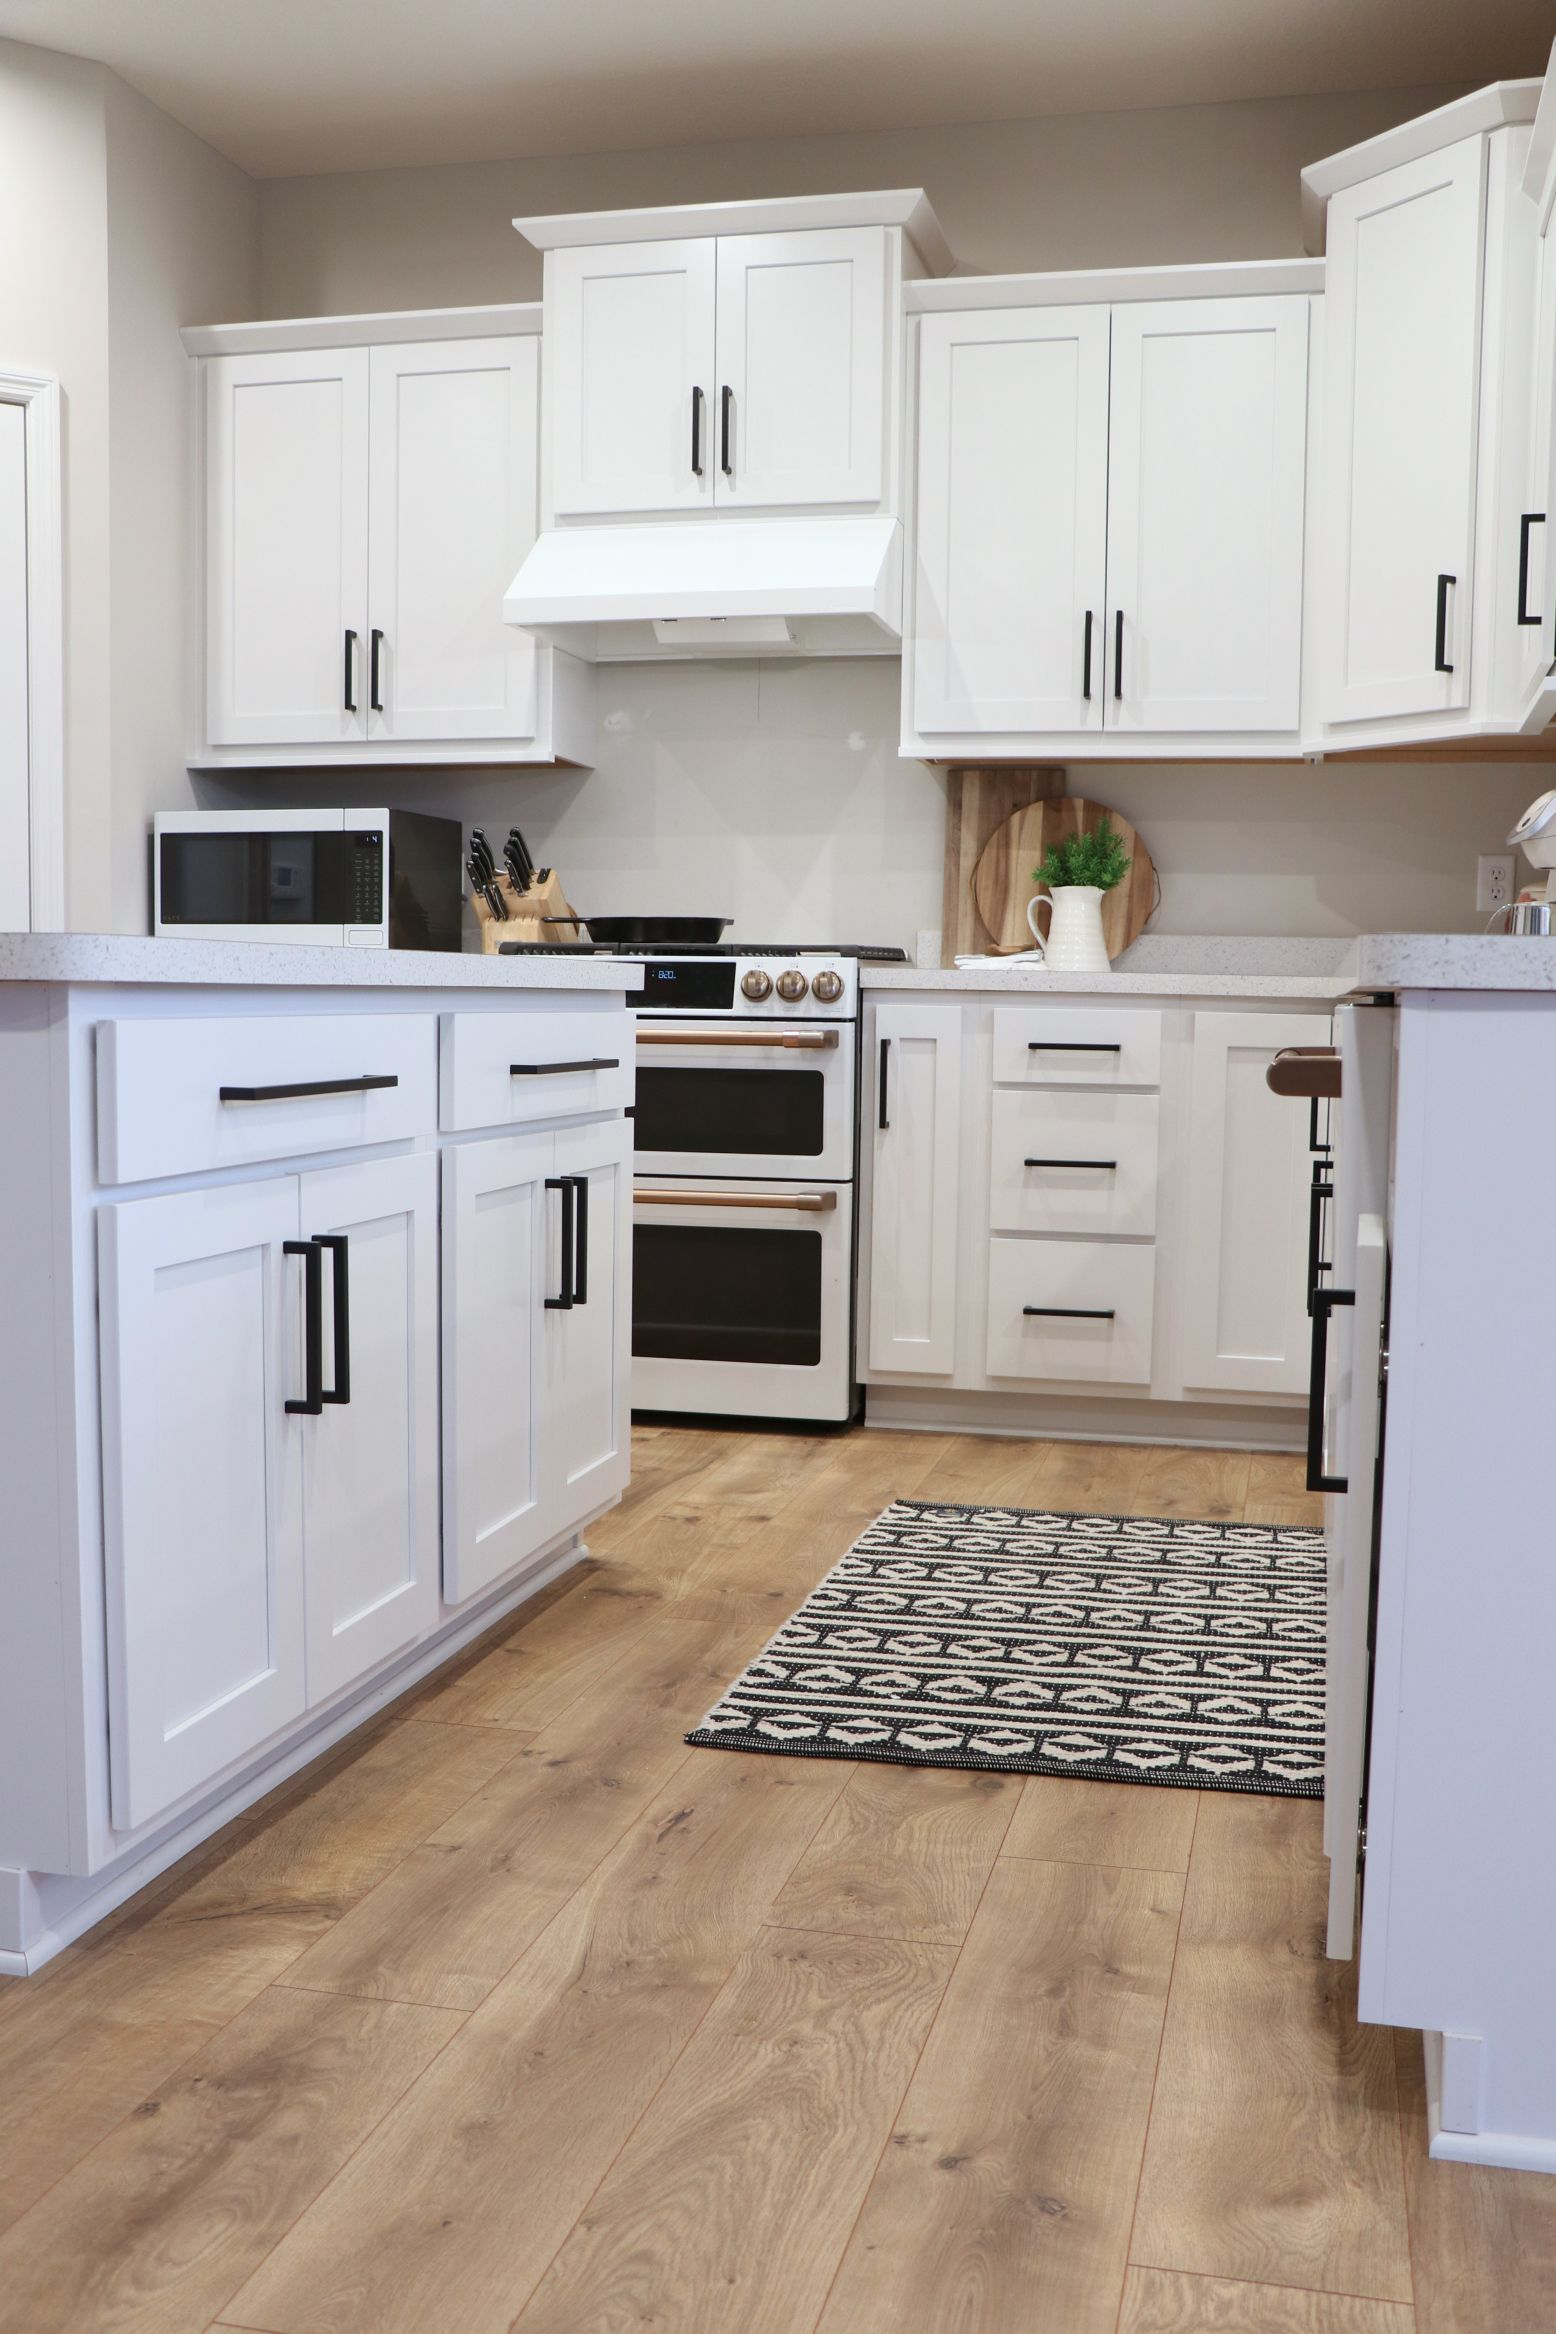 Modern farmhouse kitchen, with white and black